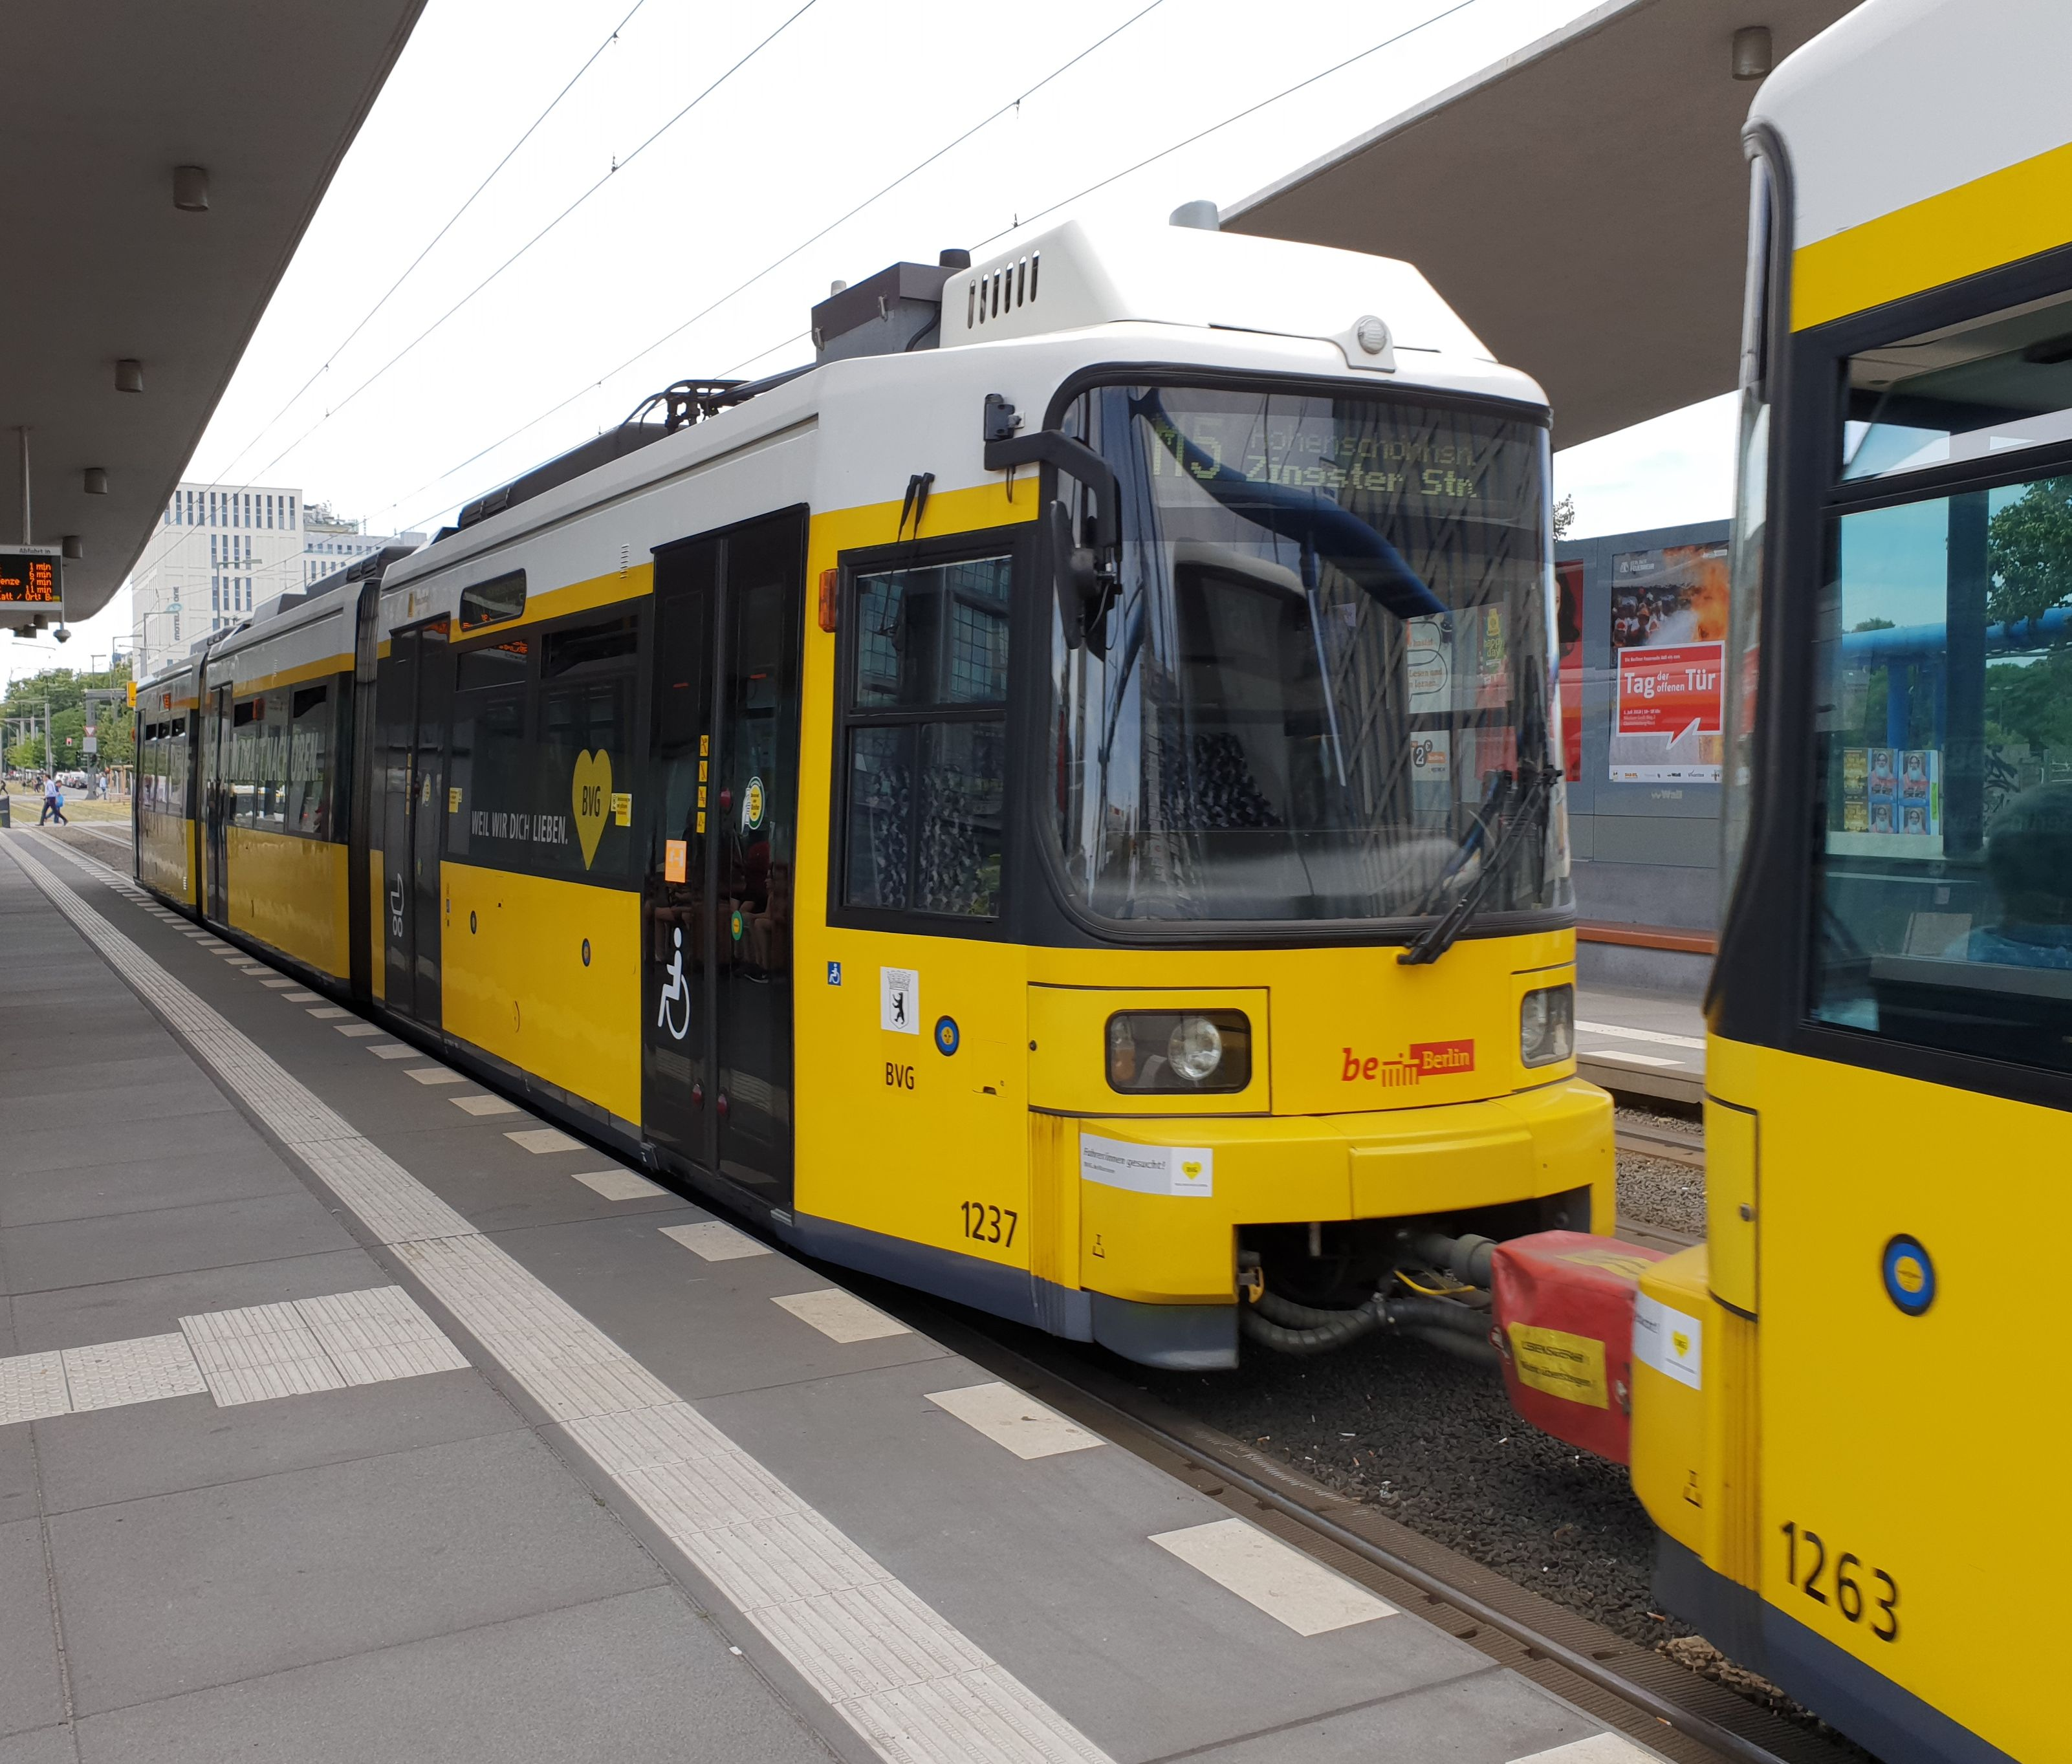 Foto: Straßenbahn 1237, Typ GT6U, Berlin Hbf, 2018